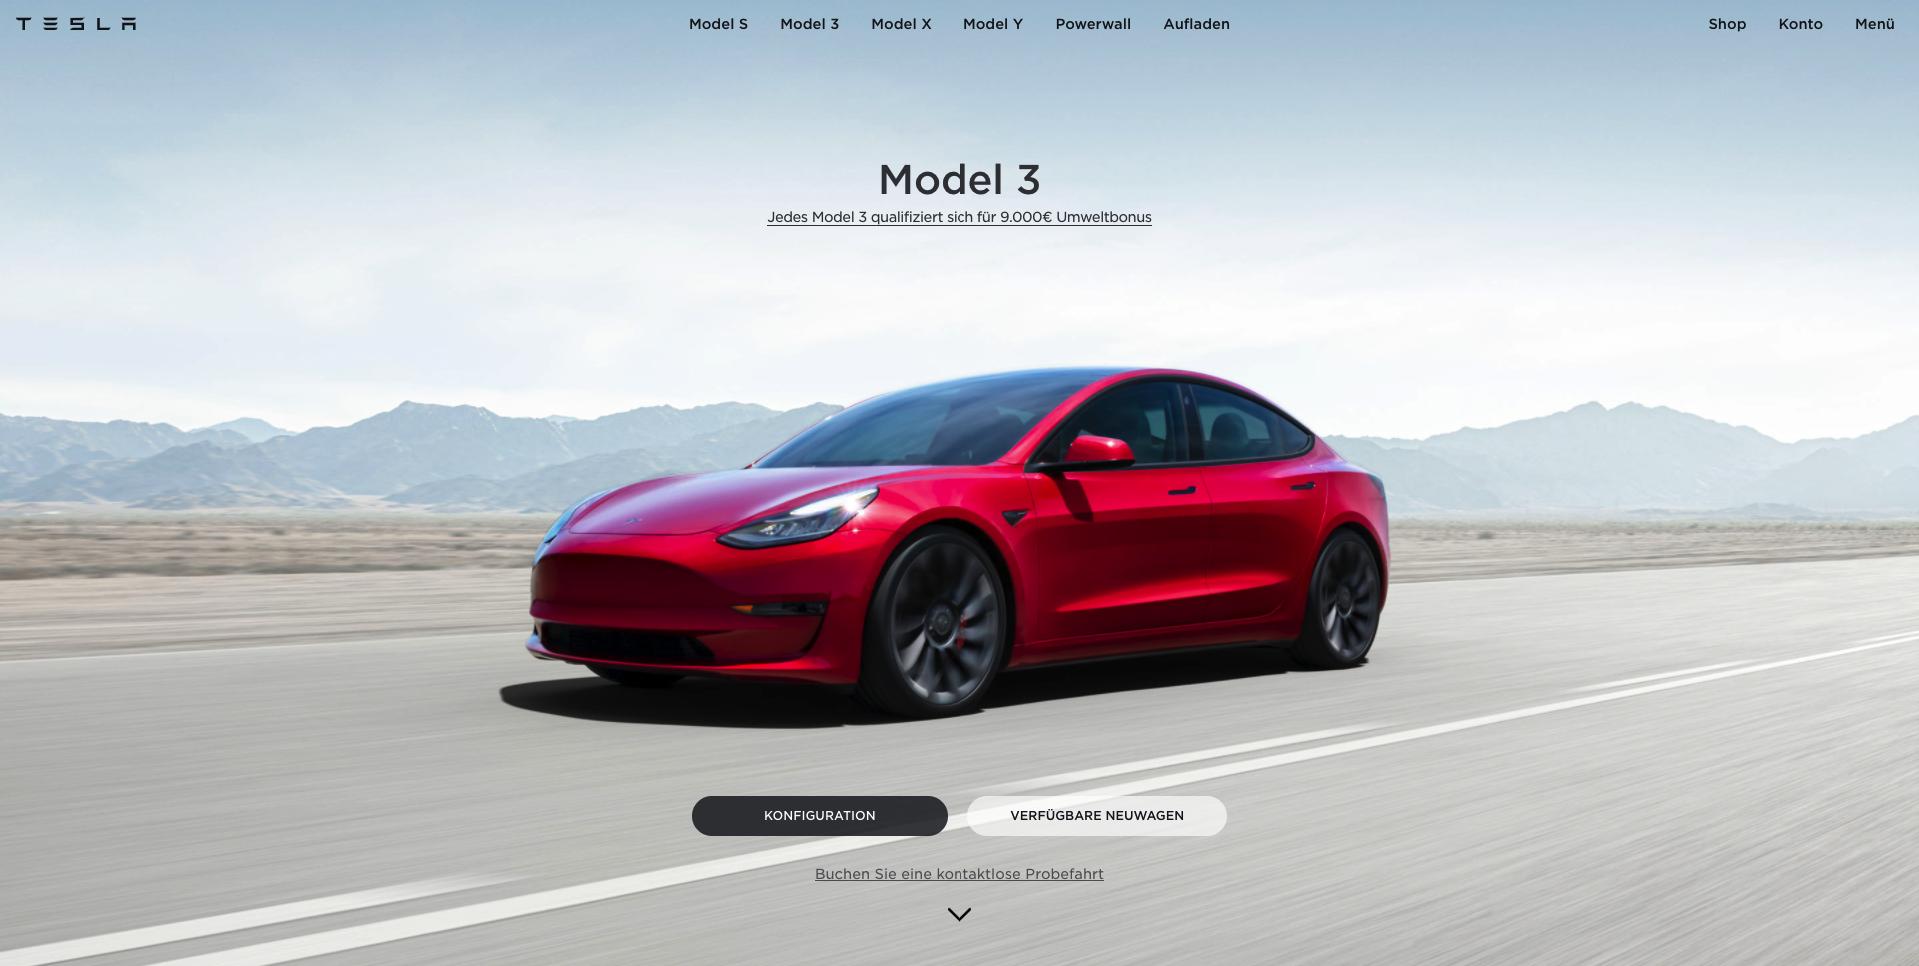 Tesla.de